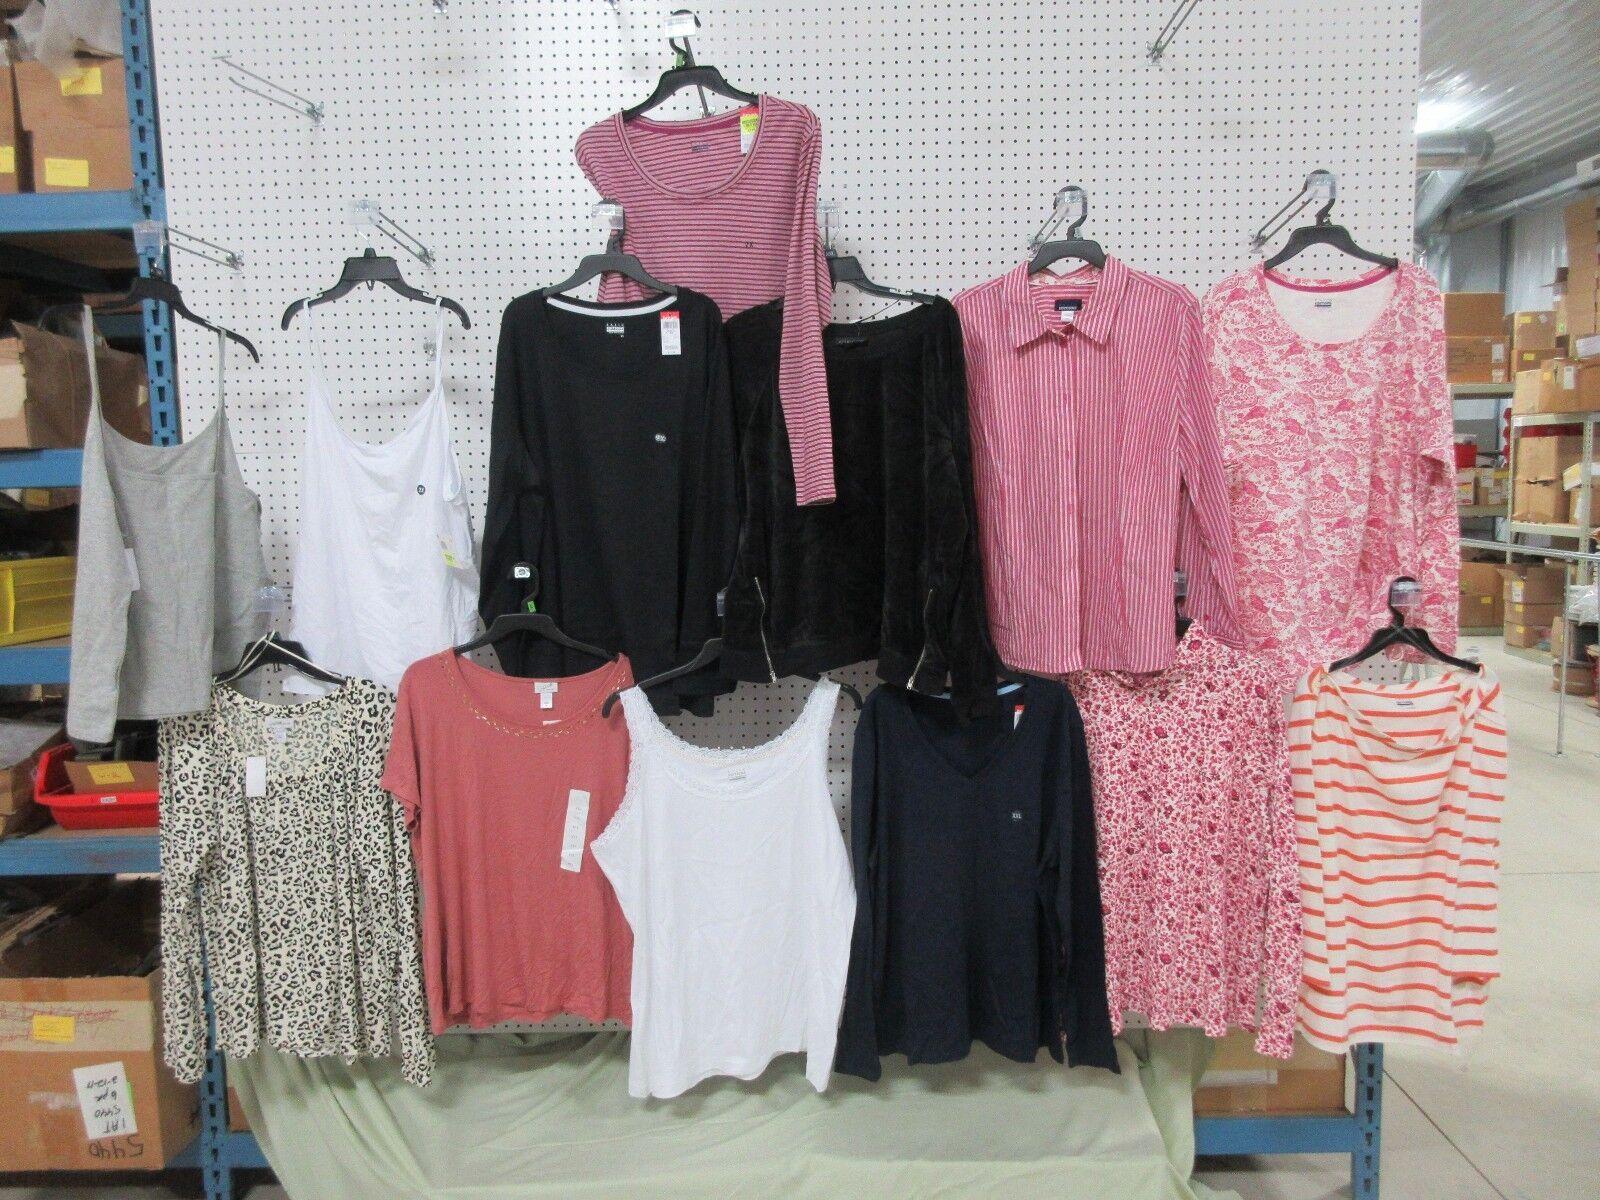 13 WOMEN 2XL SHIRT TOP LADIES CLOTHES SPAGHETTI STRAP LONG SHORT SLEEVES LOT